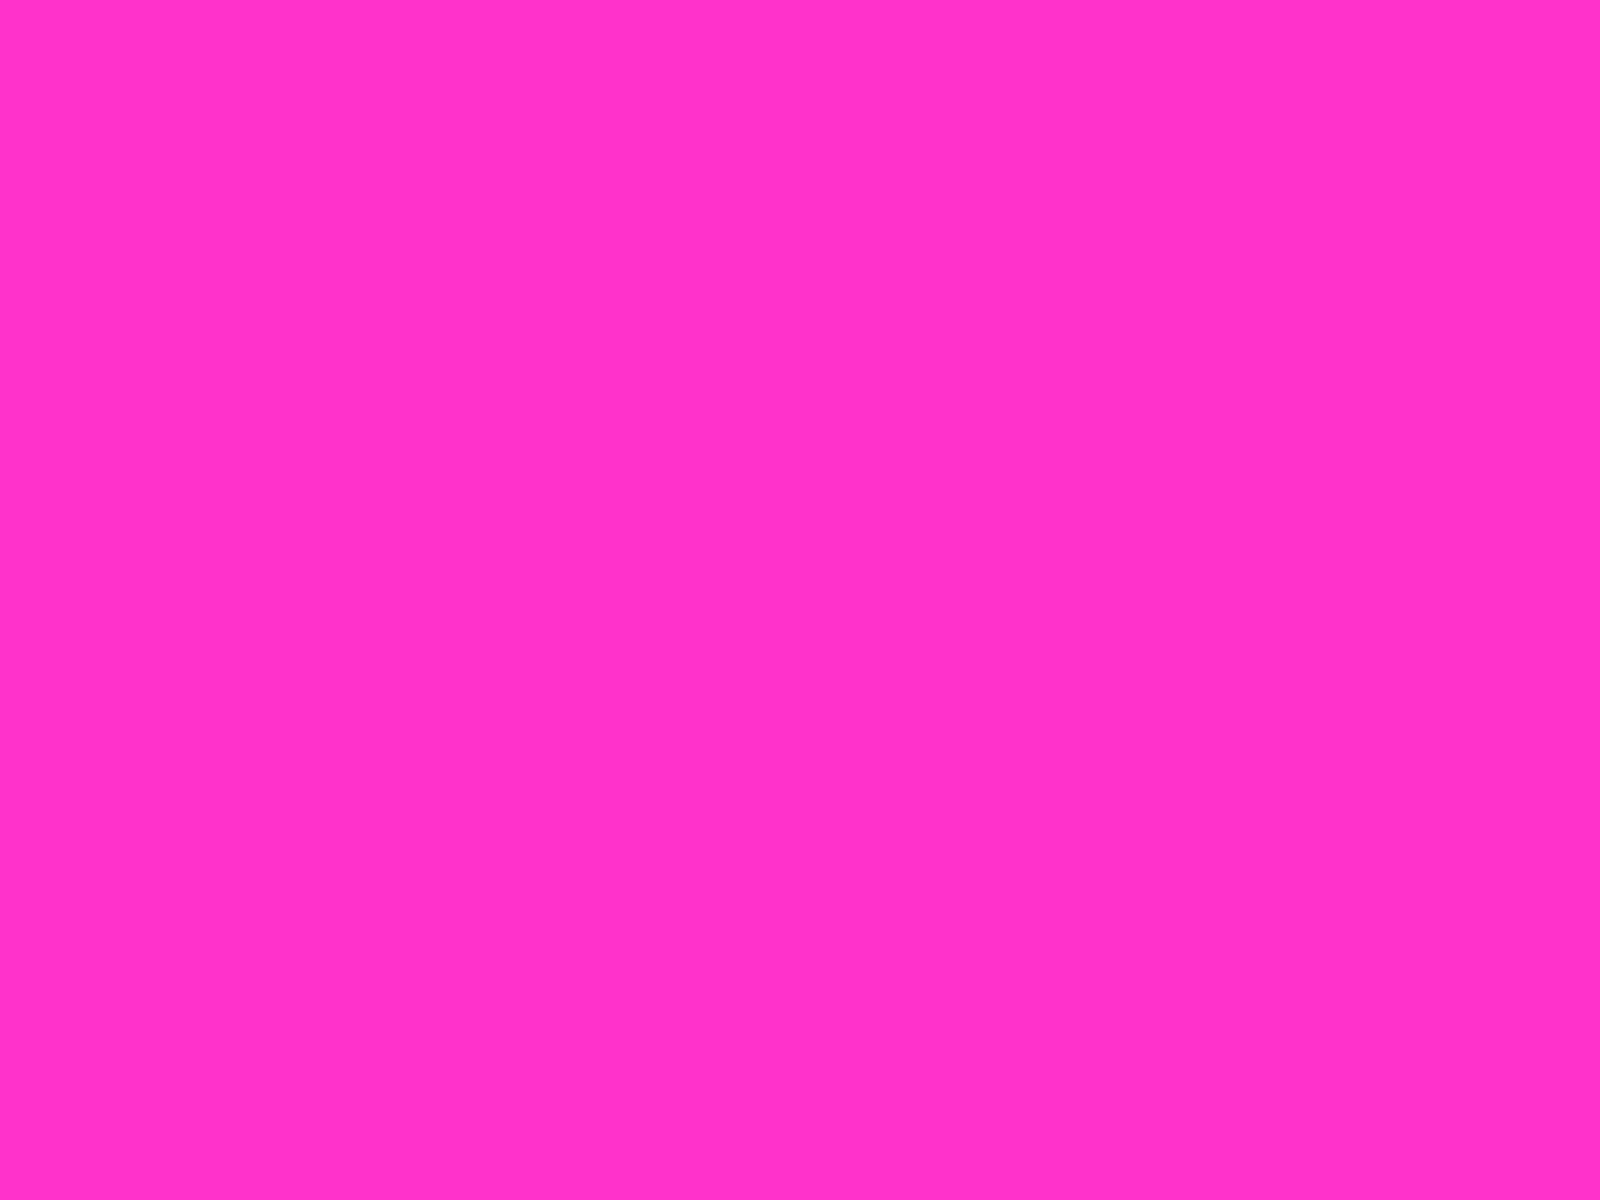 1600x1200 Razzle Dazzle Rose Solid Color Background